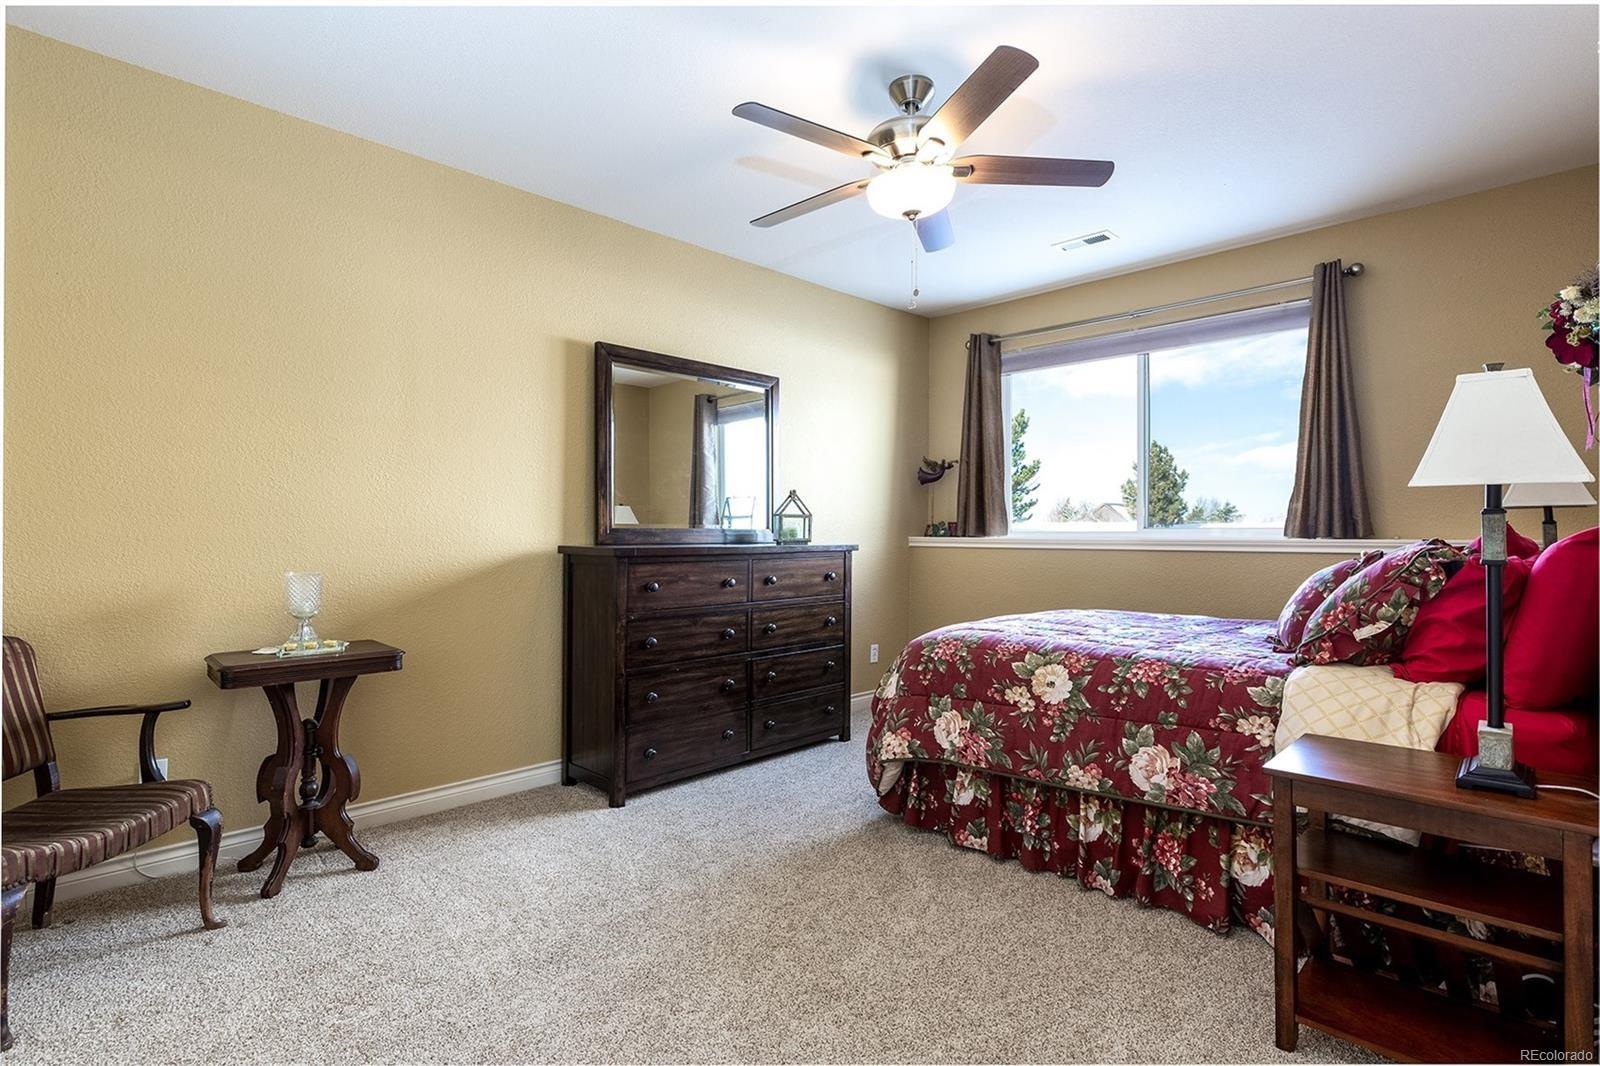 MLS# 4807349 - 30 - 15325 Terra Ridge Circle, Colorado Springs, CO 80908